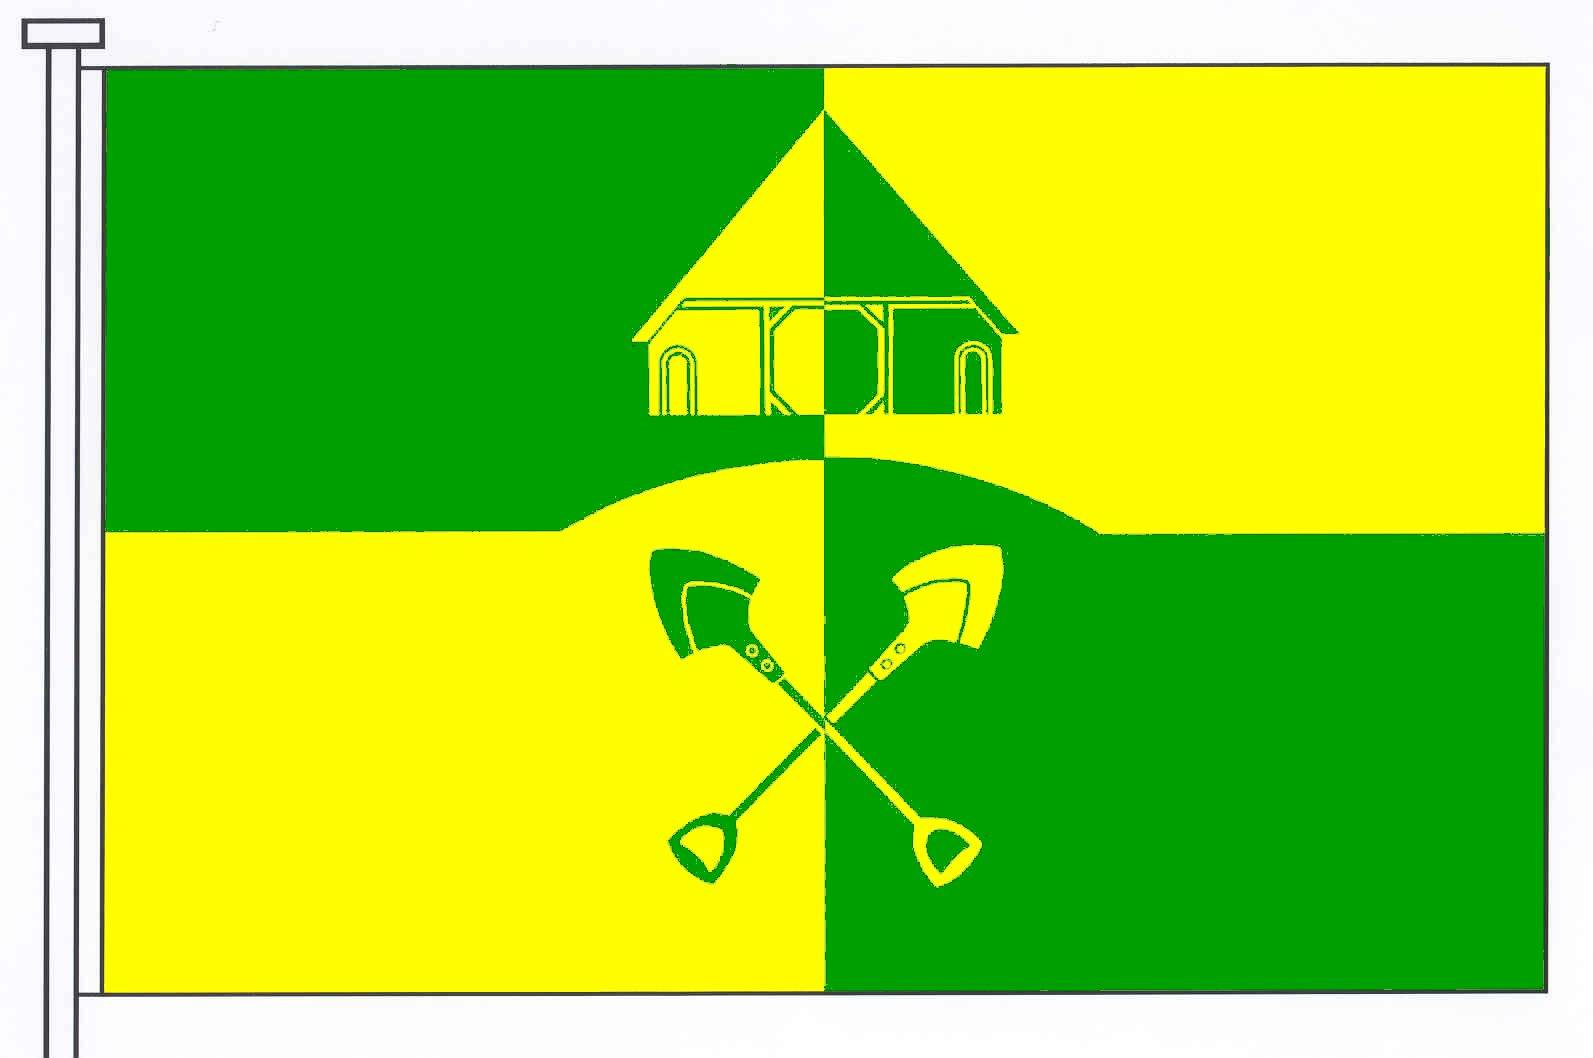 Flagge GemeindeBörm, Kreis Schleswig-Flensburg